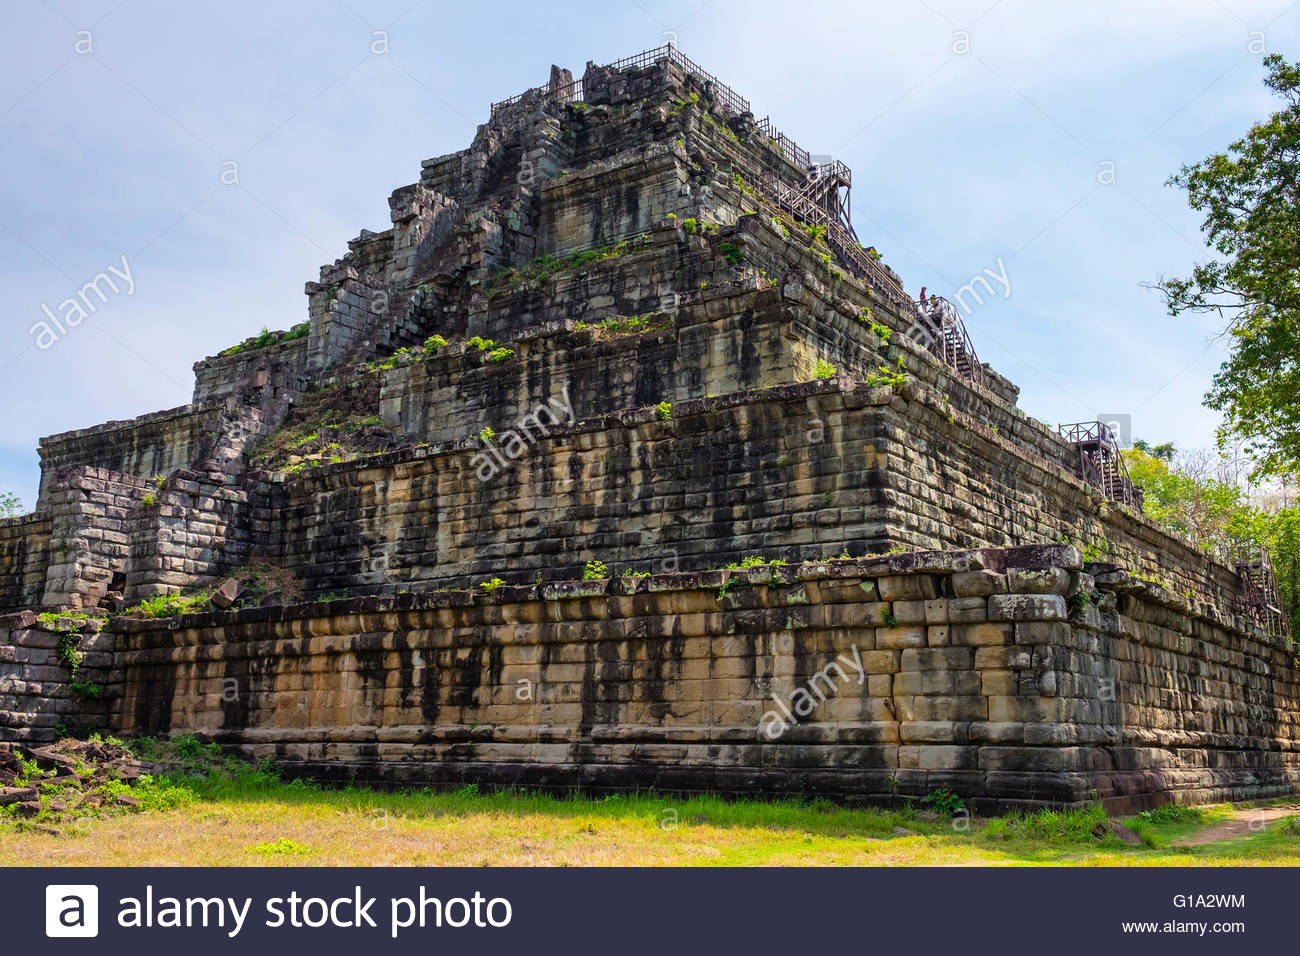 Seven‑tiered pyramid Prasat Prang at Prasat Thom, Koh Ker temple ruins, Preah Vihear Province, Cambodia - Stock Image